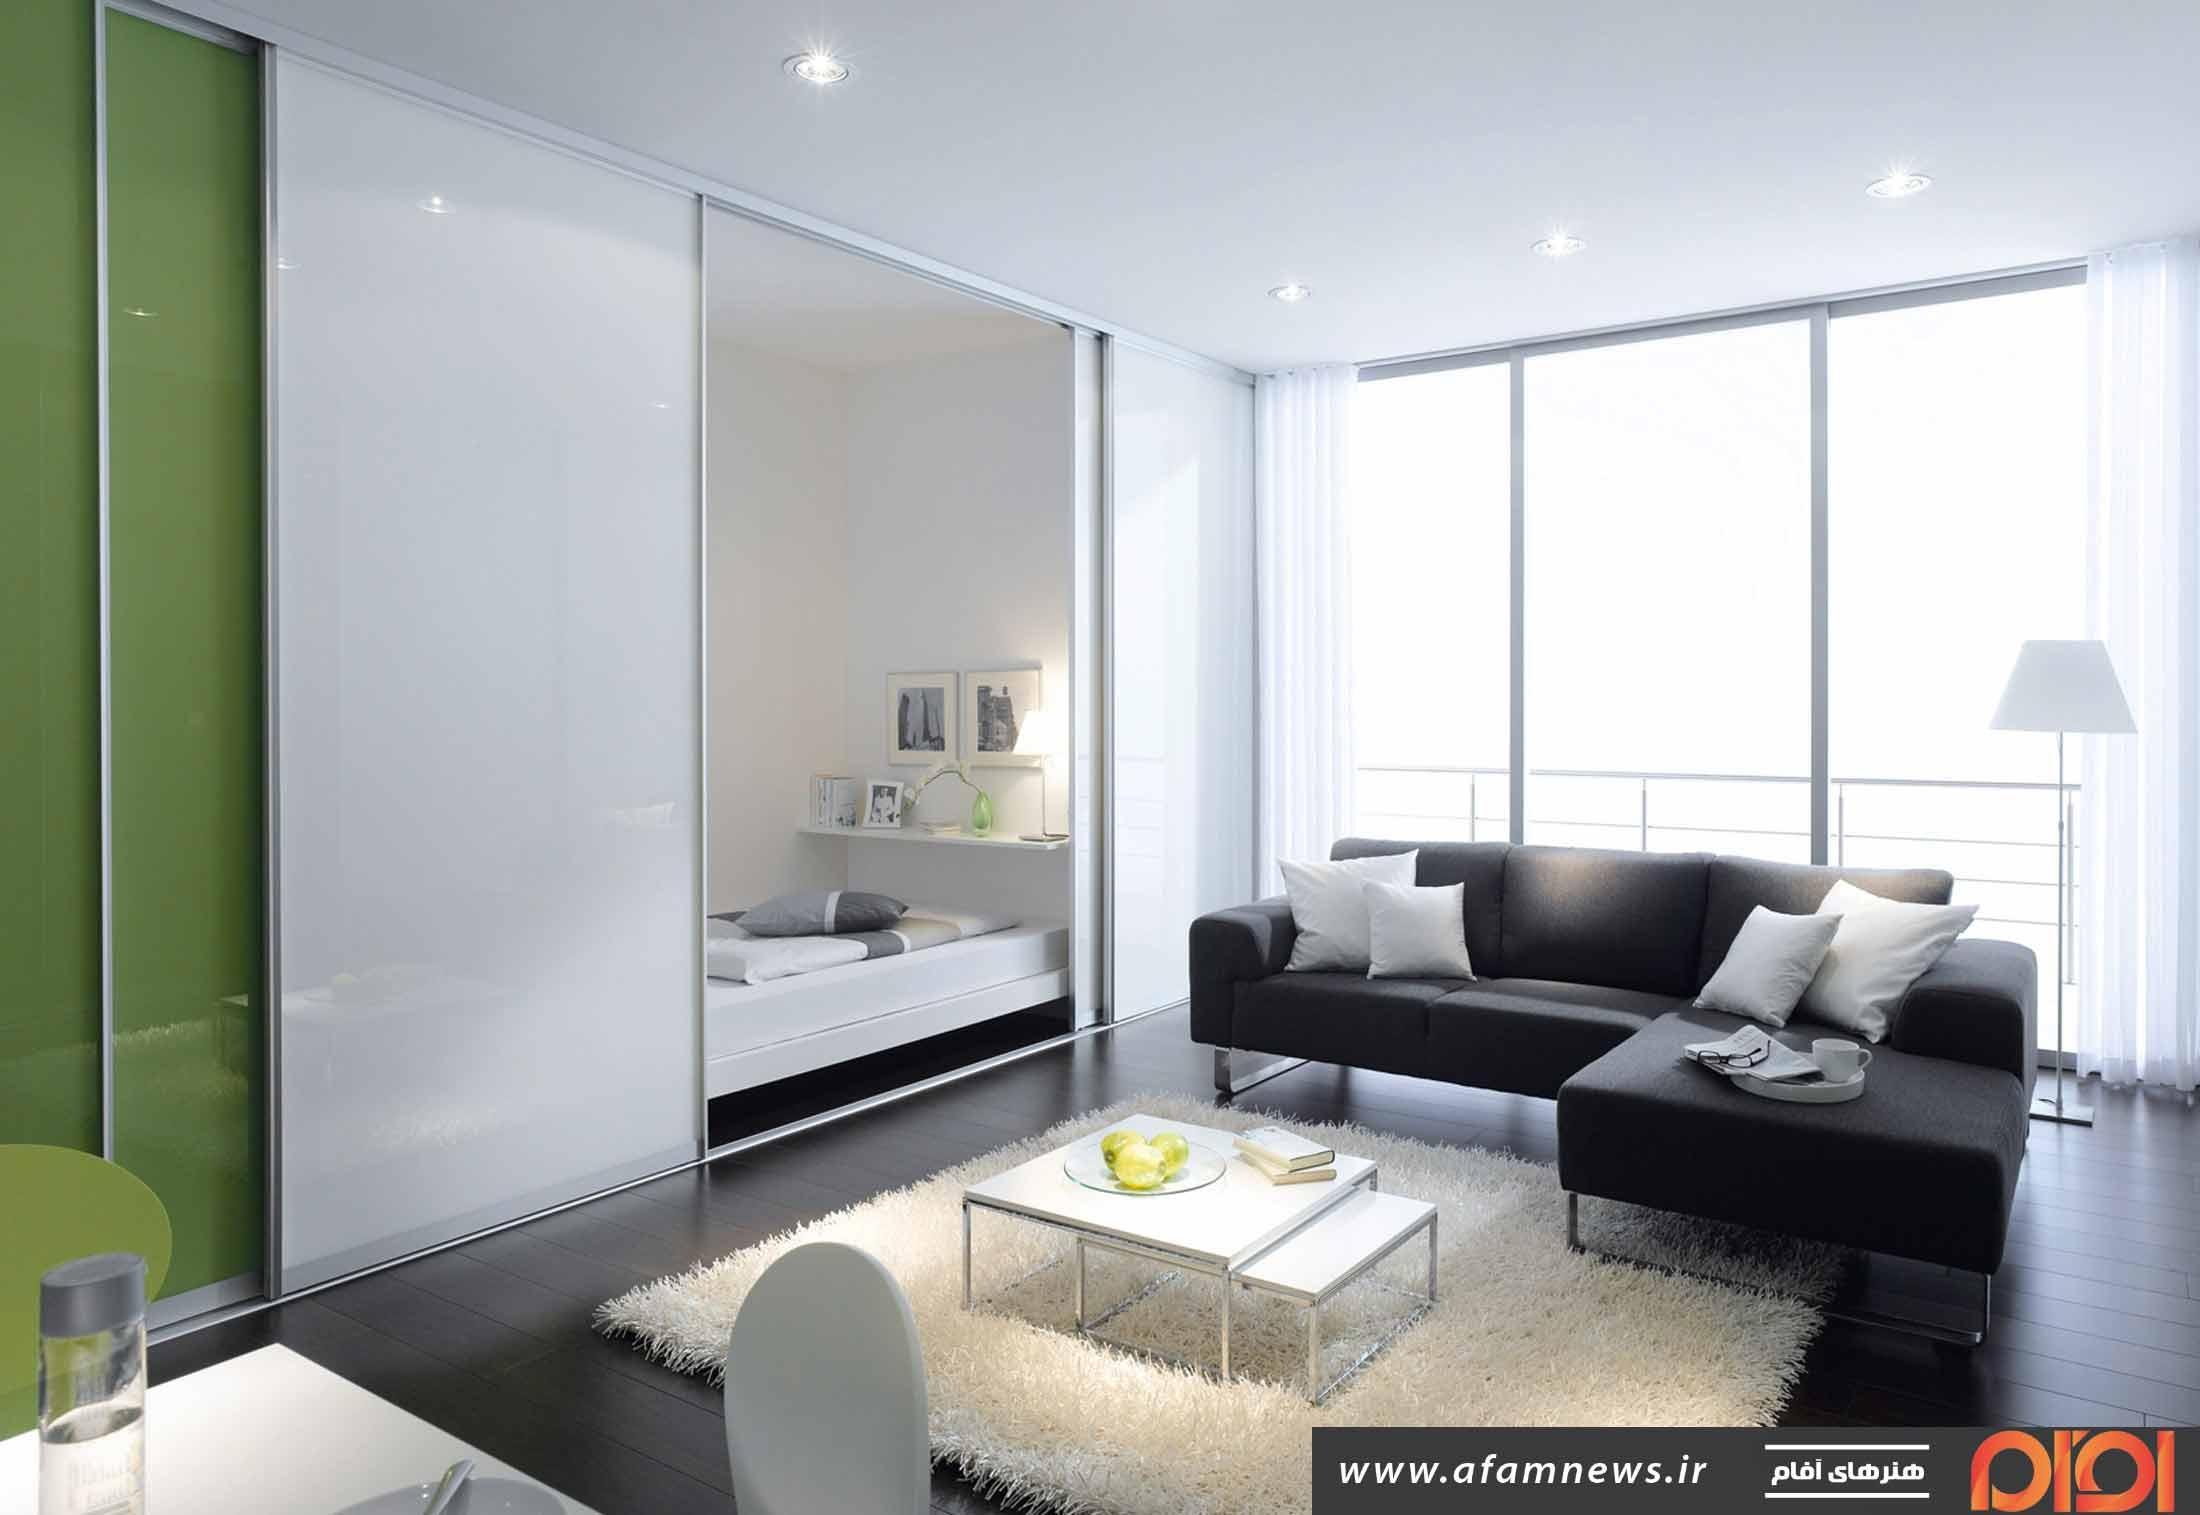 Divider: Inspiring Floor To Ceiling Room Dividers Hanging .